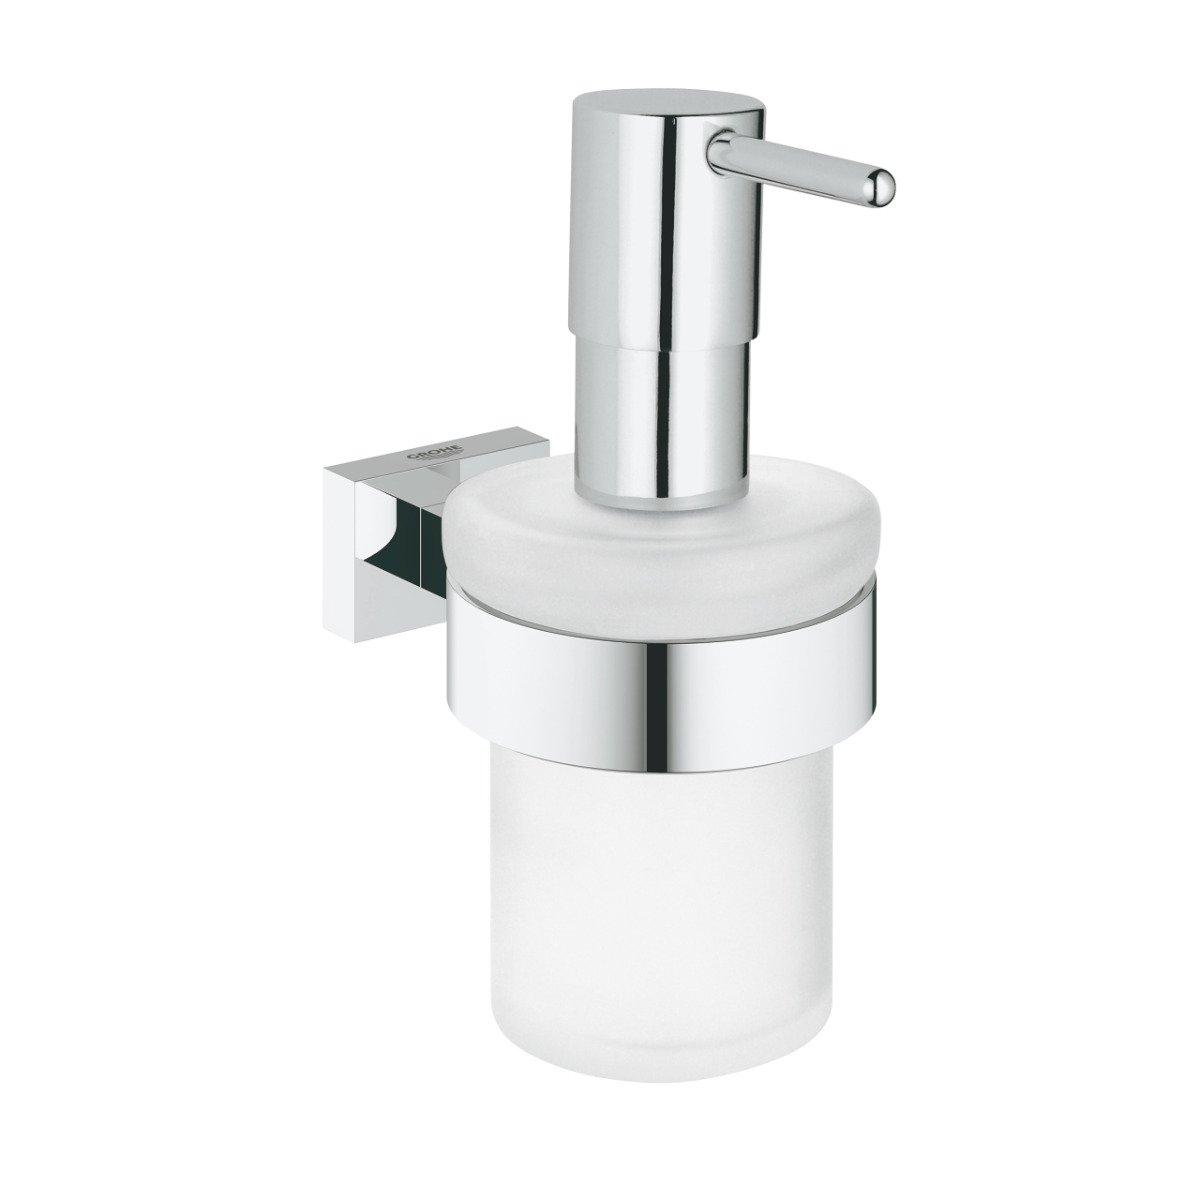 Dispenser sapun lichid Grohe Essentials Cube, cu suport, Crom-40756001 imagine